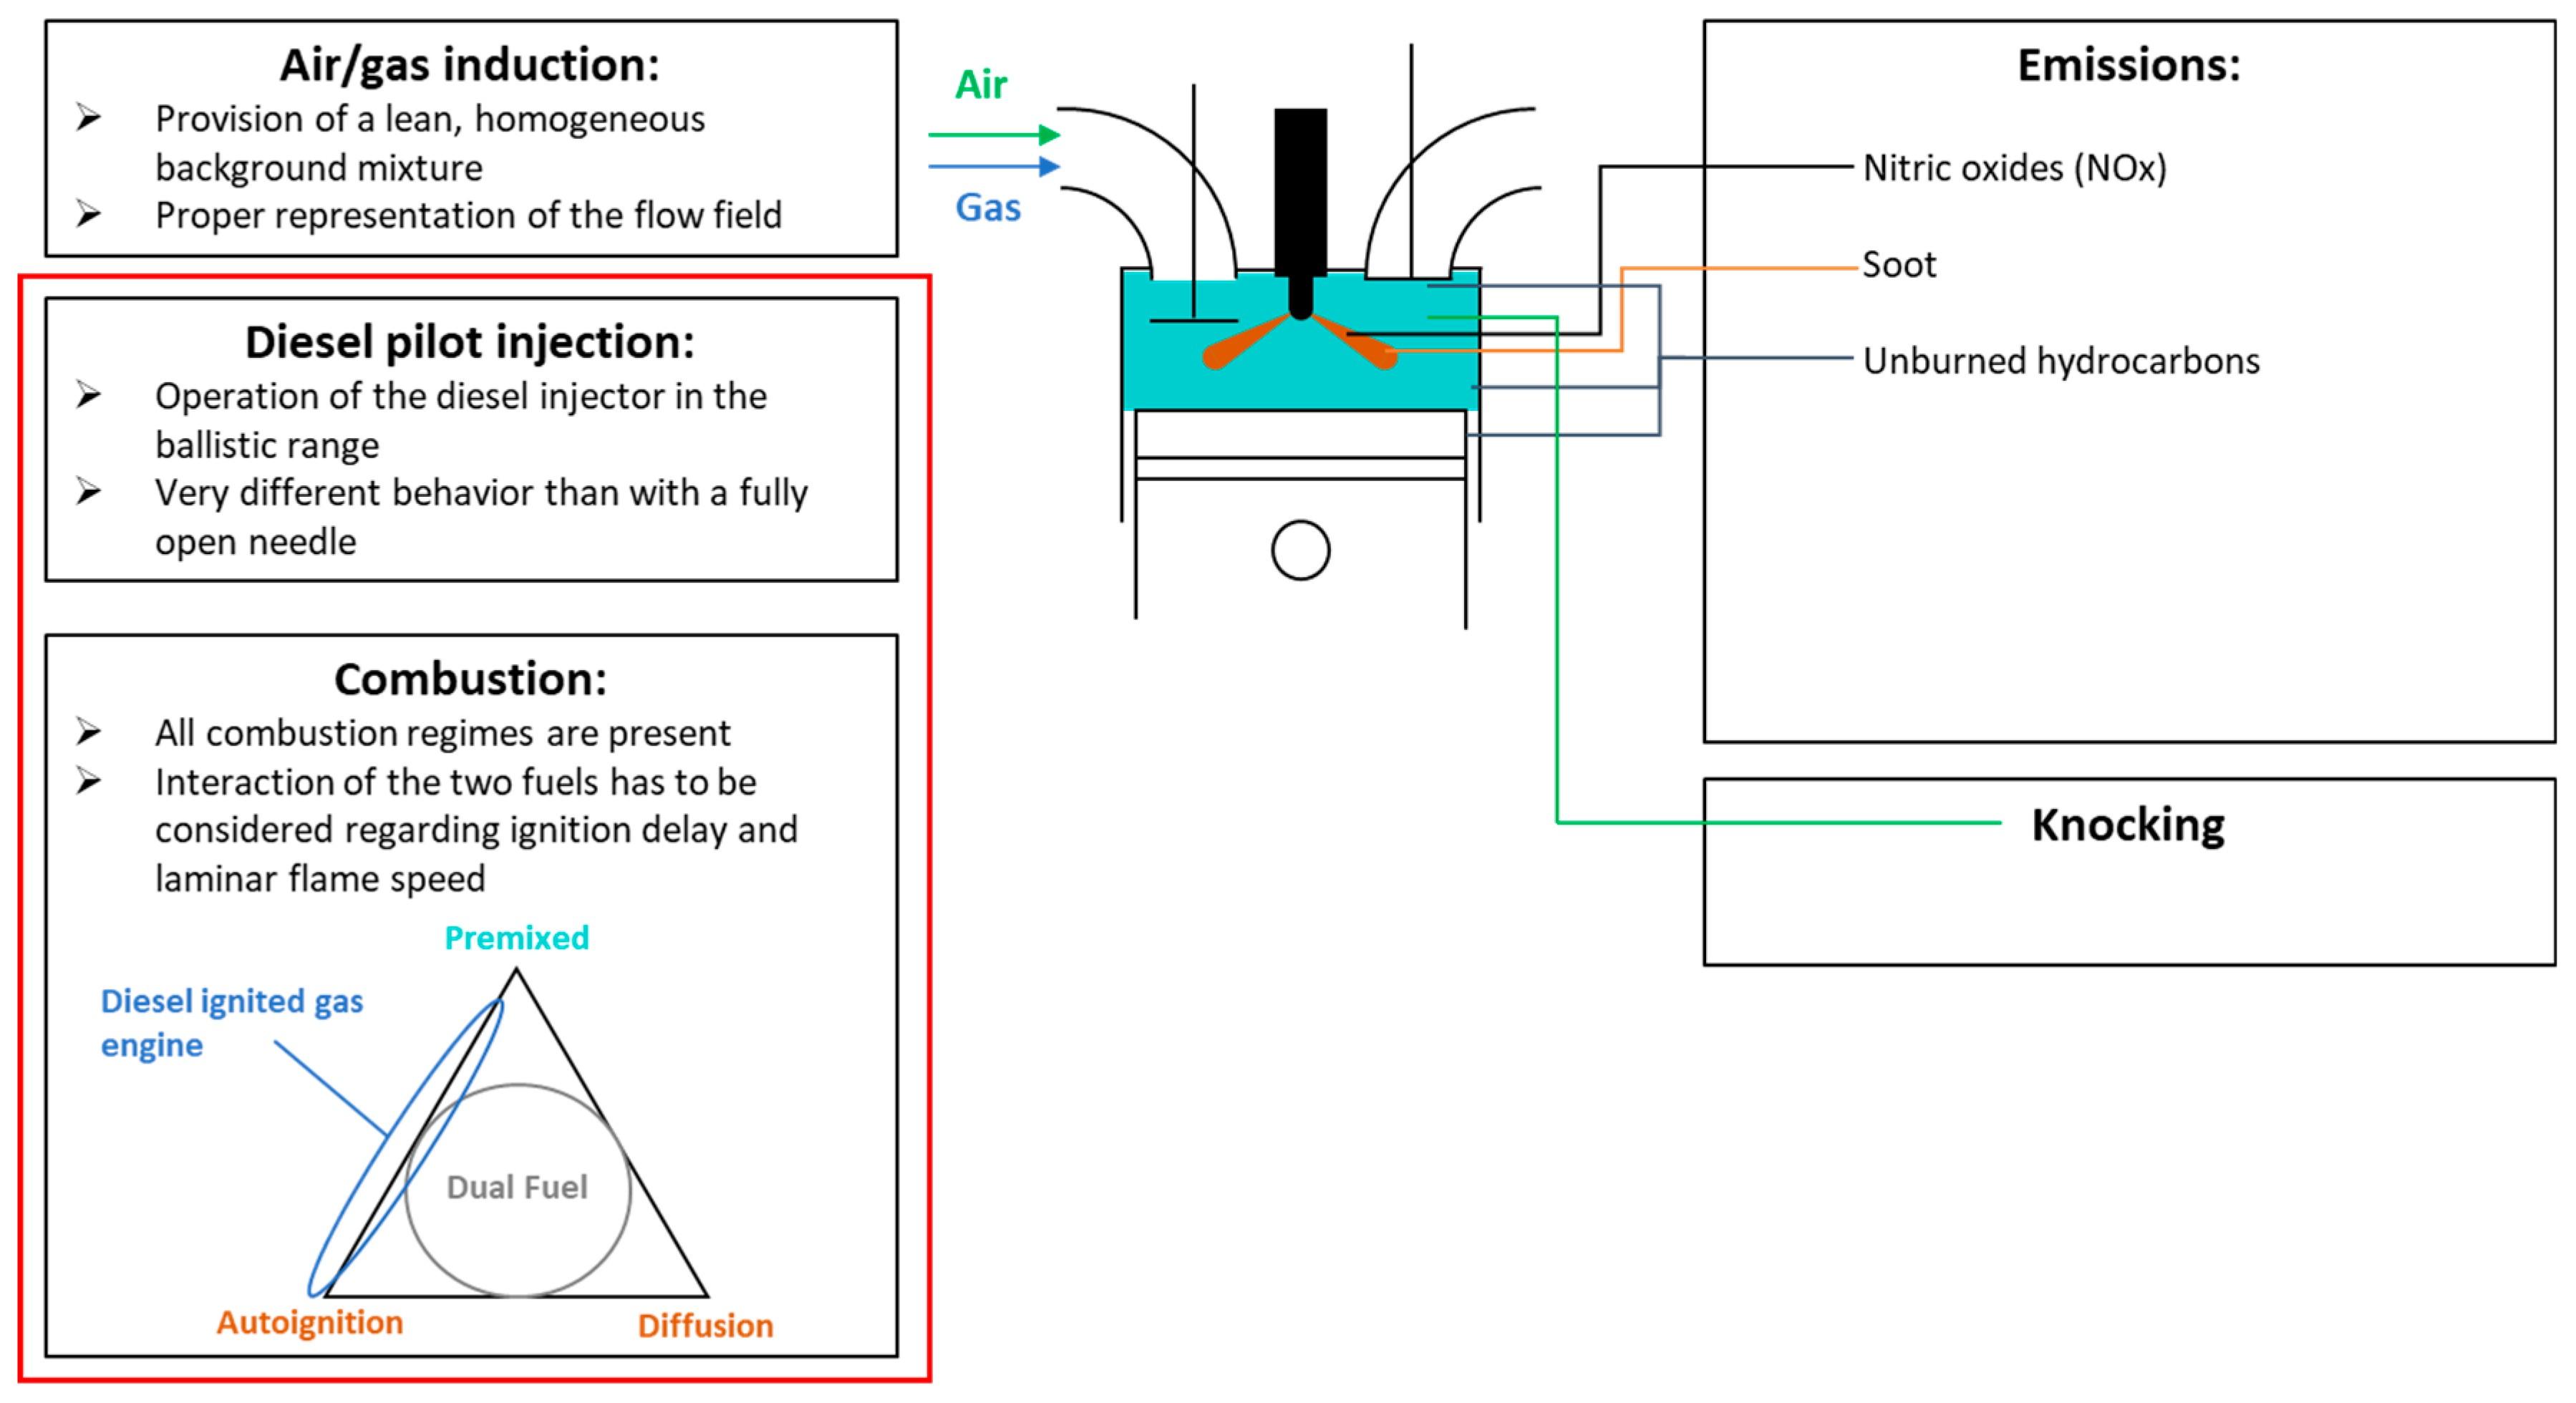 Gas Engine Diagram Energies Free Full Text Of Gas Engine Diagram